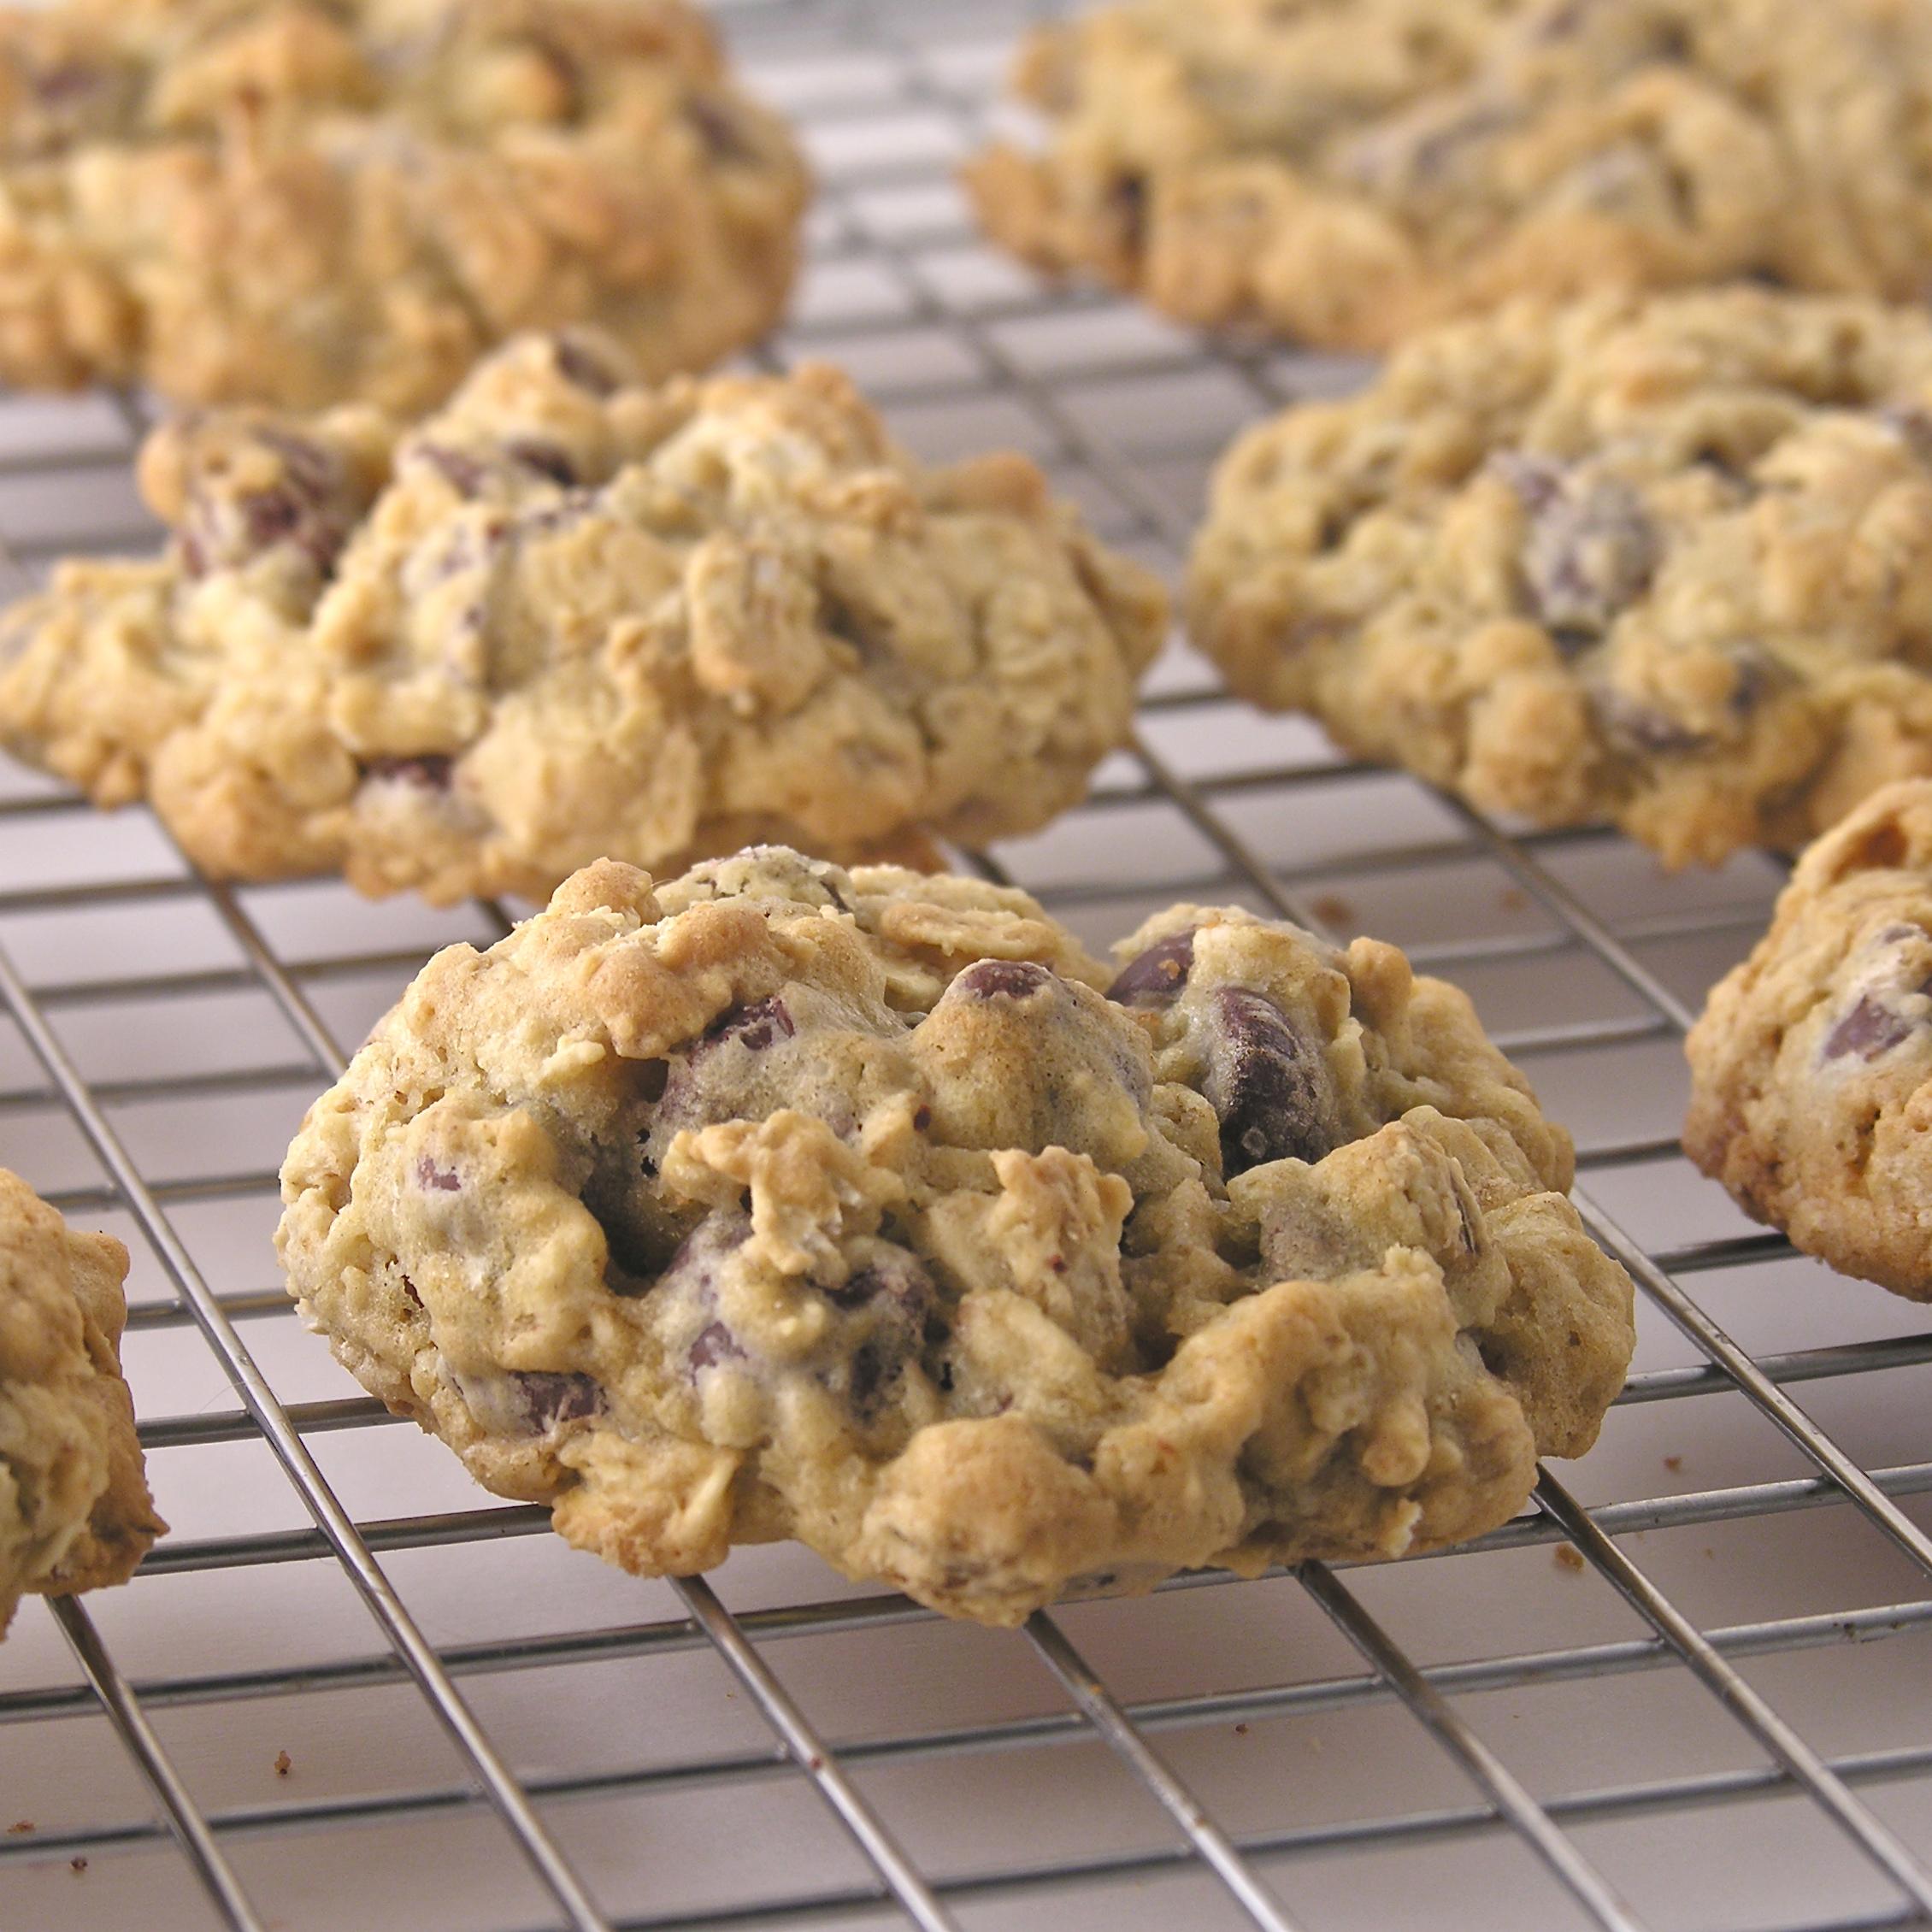 Chocolate Chip Oatmeal Cookies | eASYbAKED